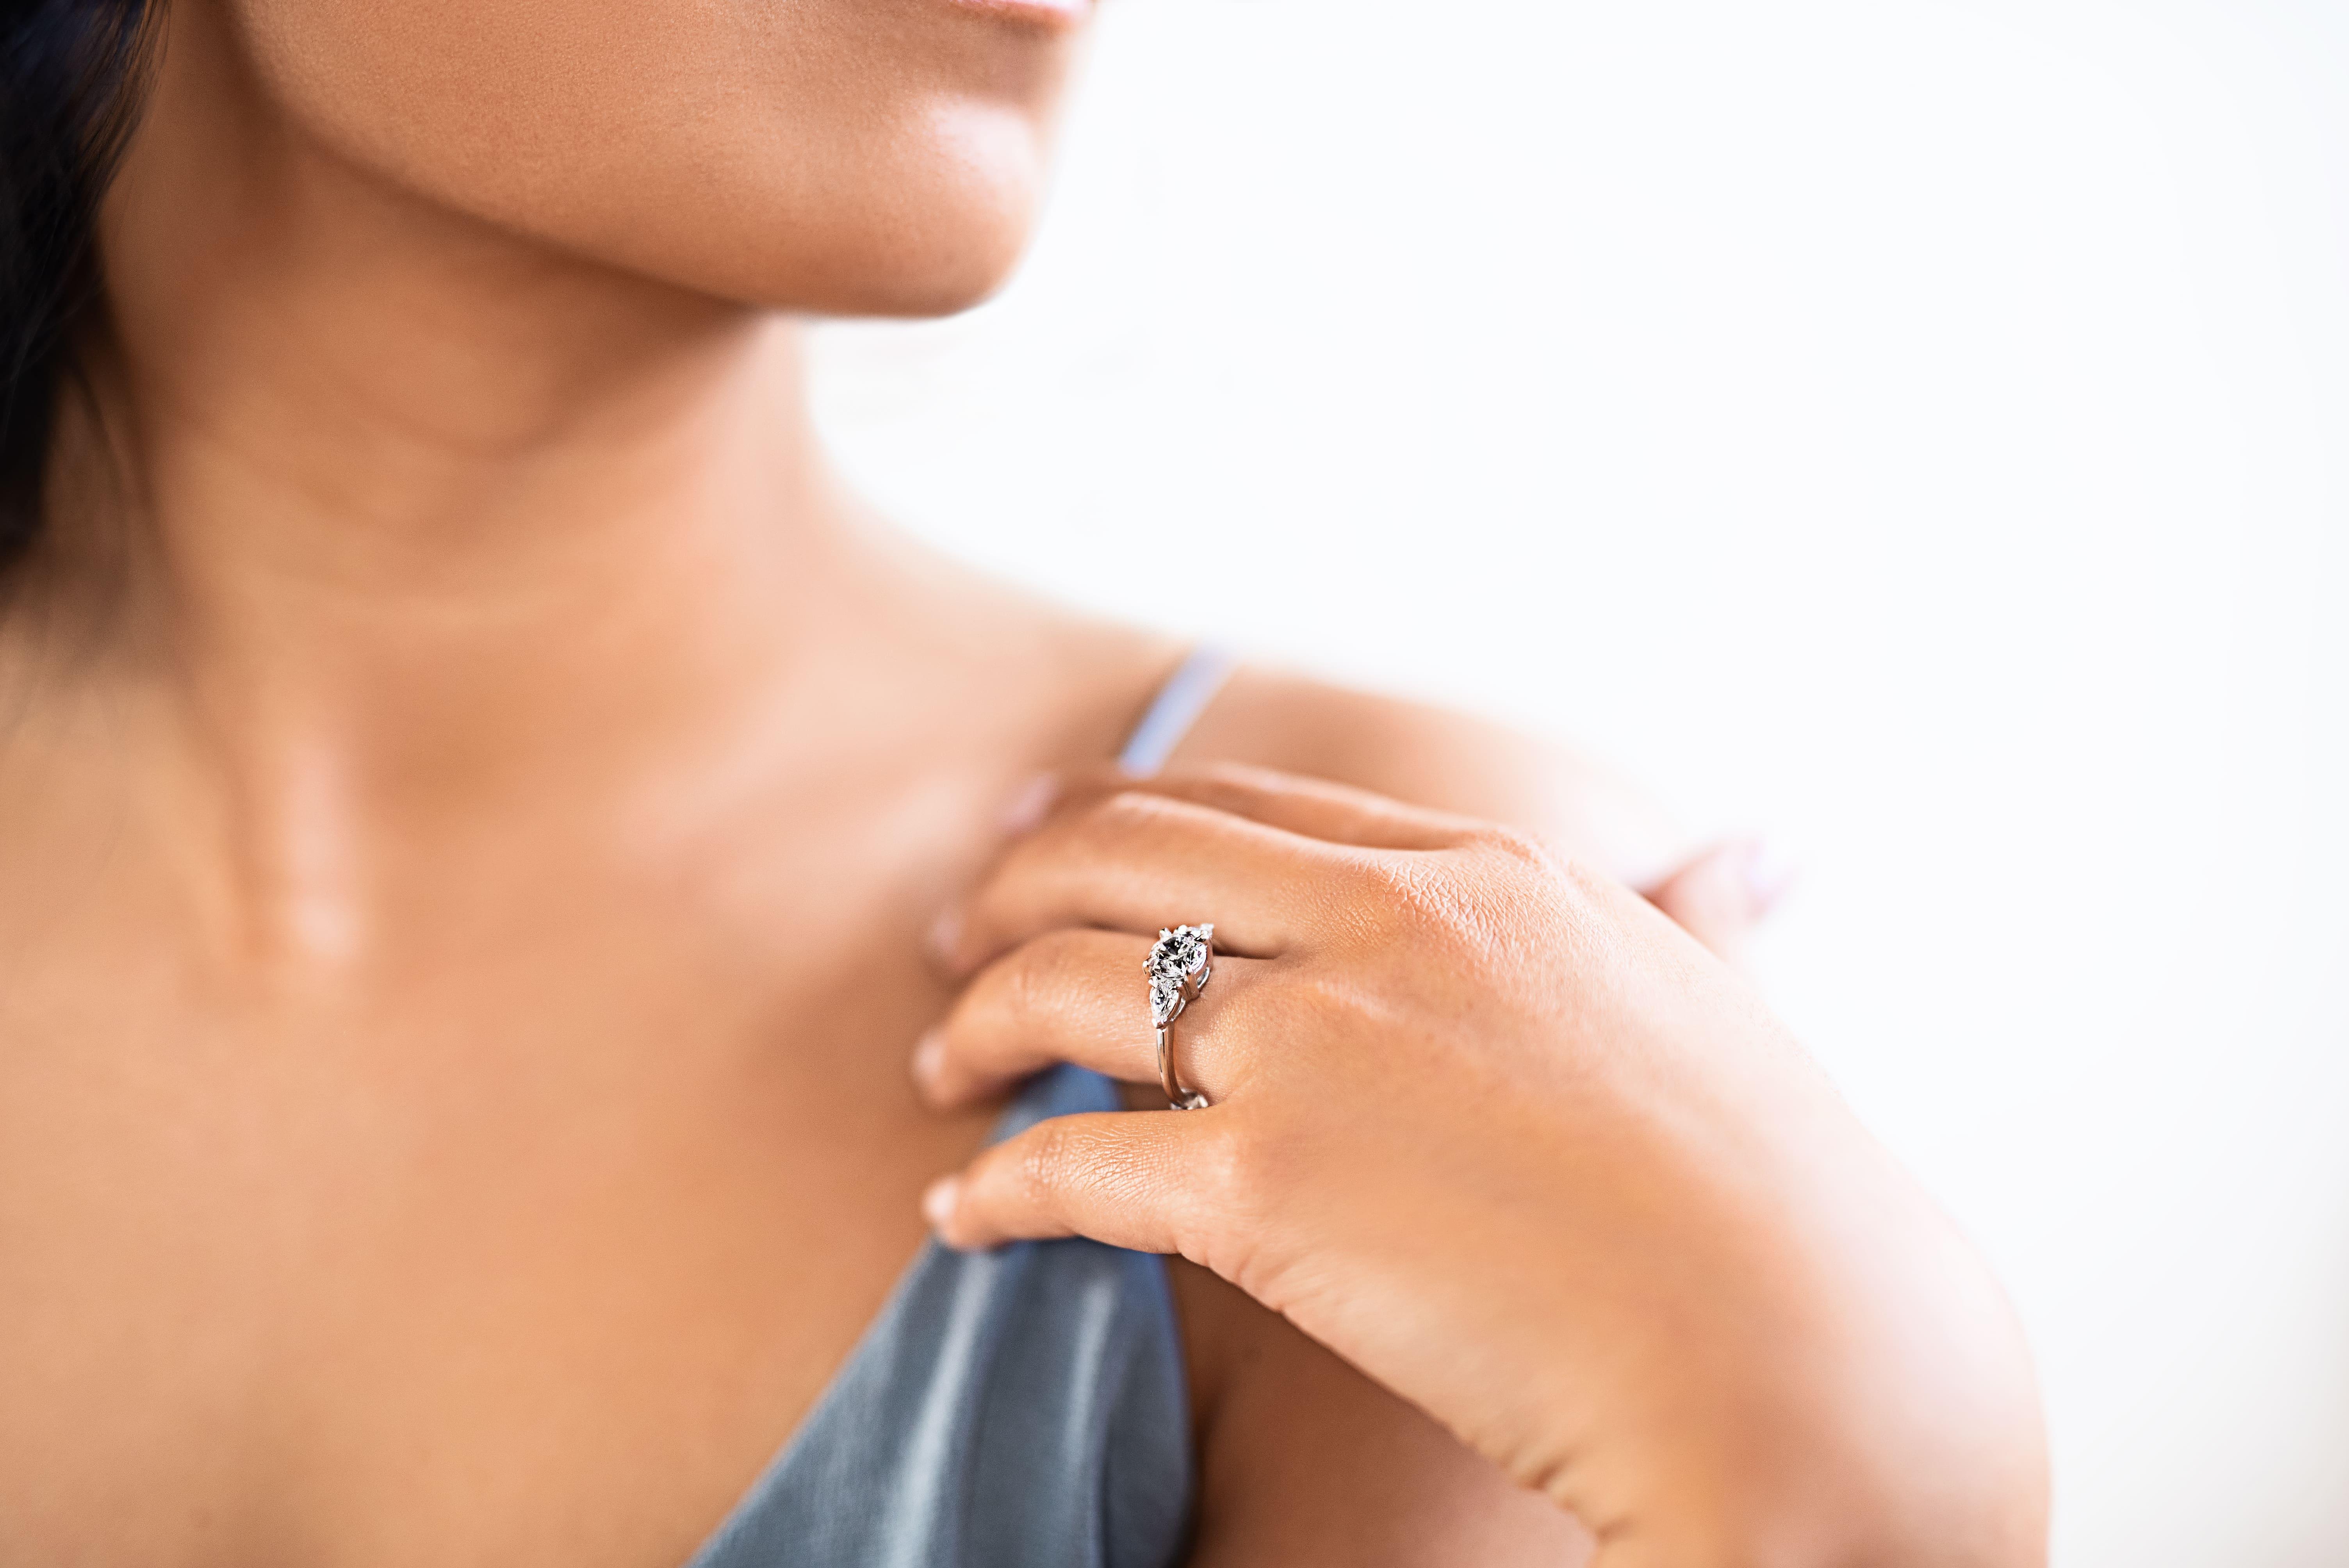 Petite Collection Wedding Set - Lab Grown Diamond Engagement Rings - MiaDonna